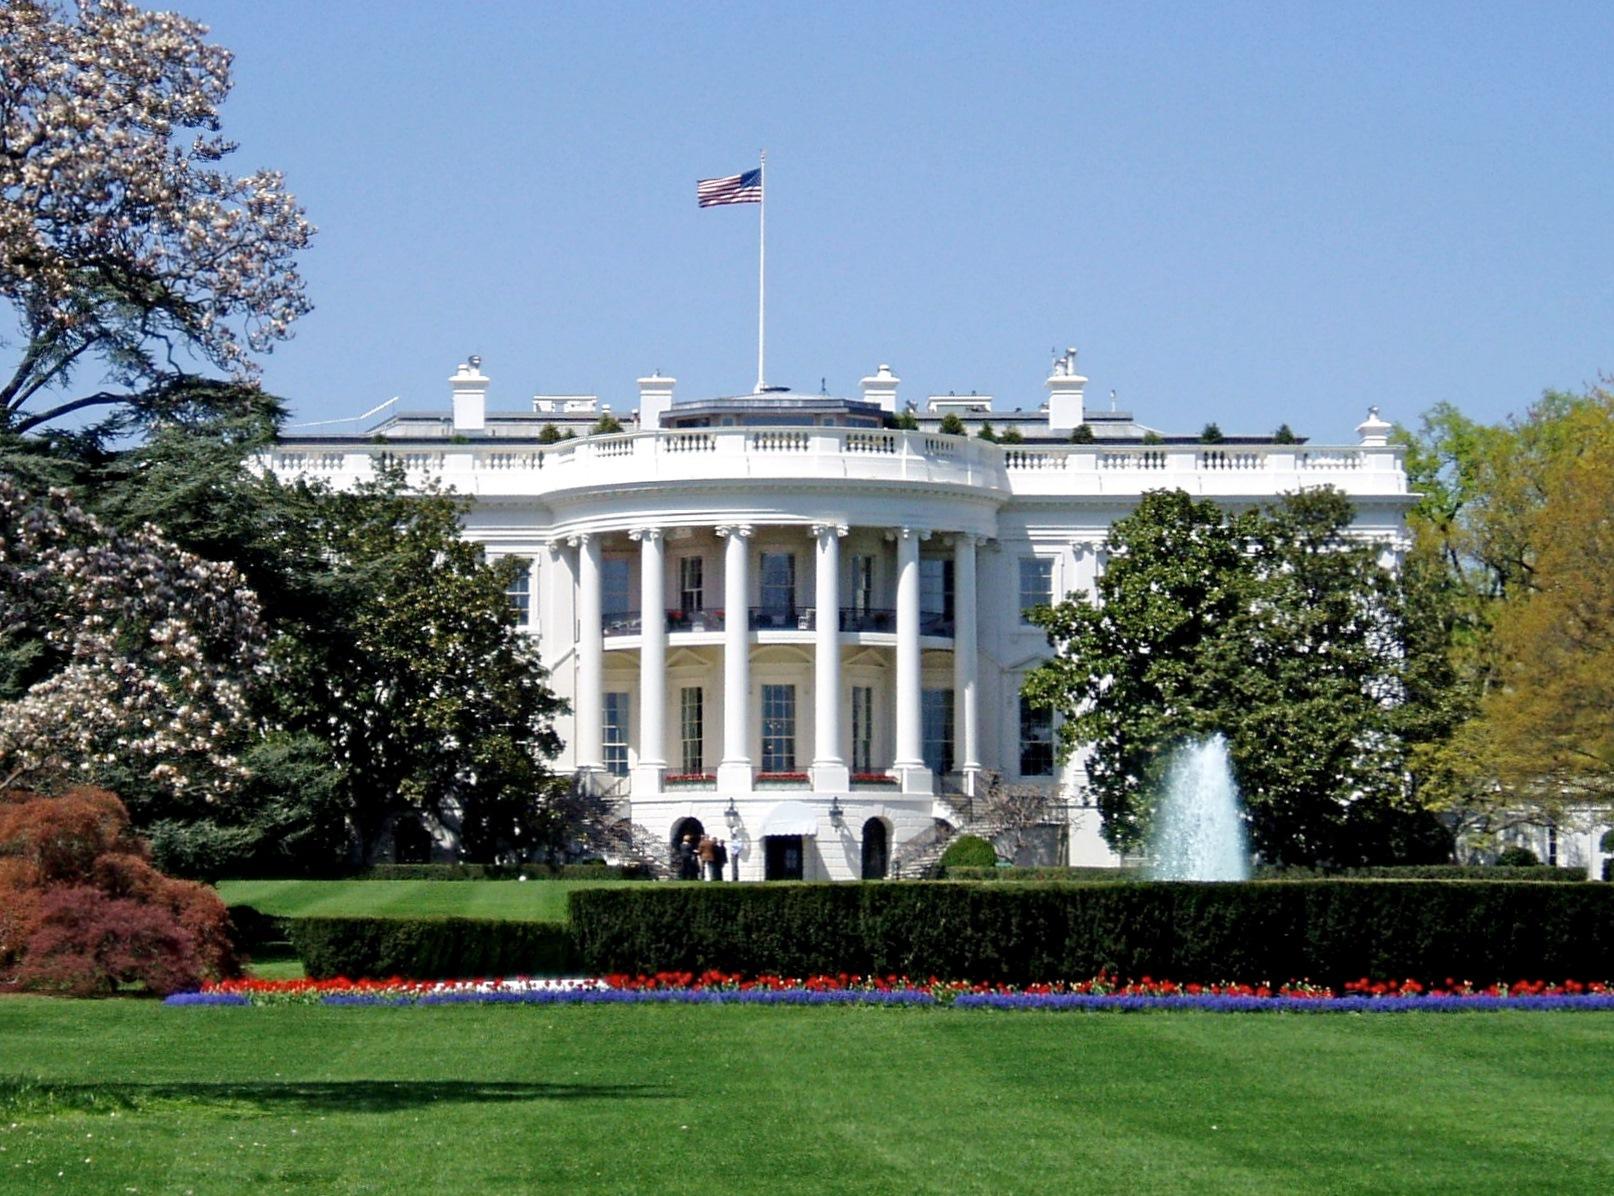 The White House. Credit: Matt Wade Photography.